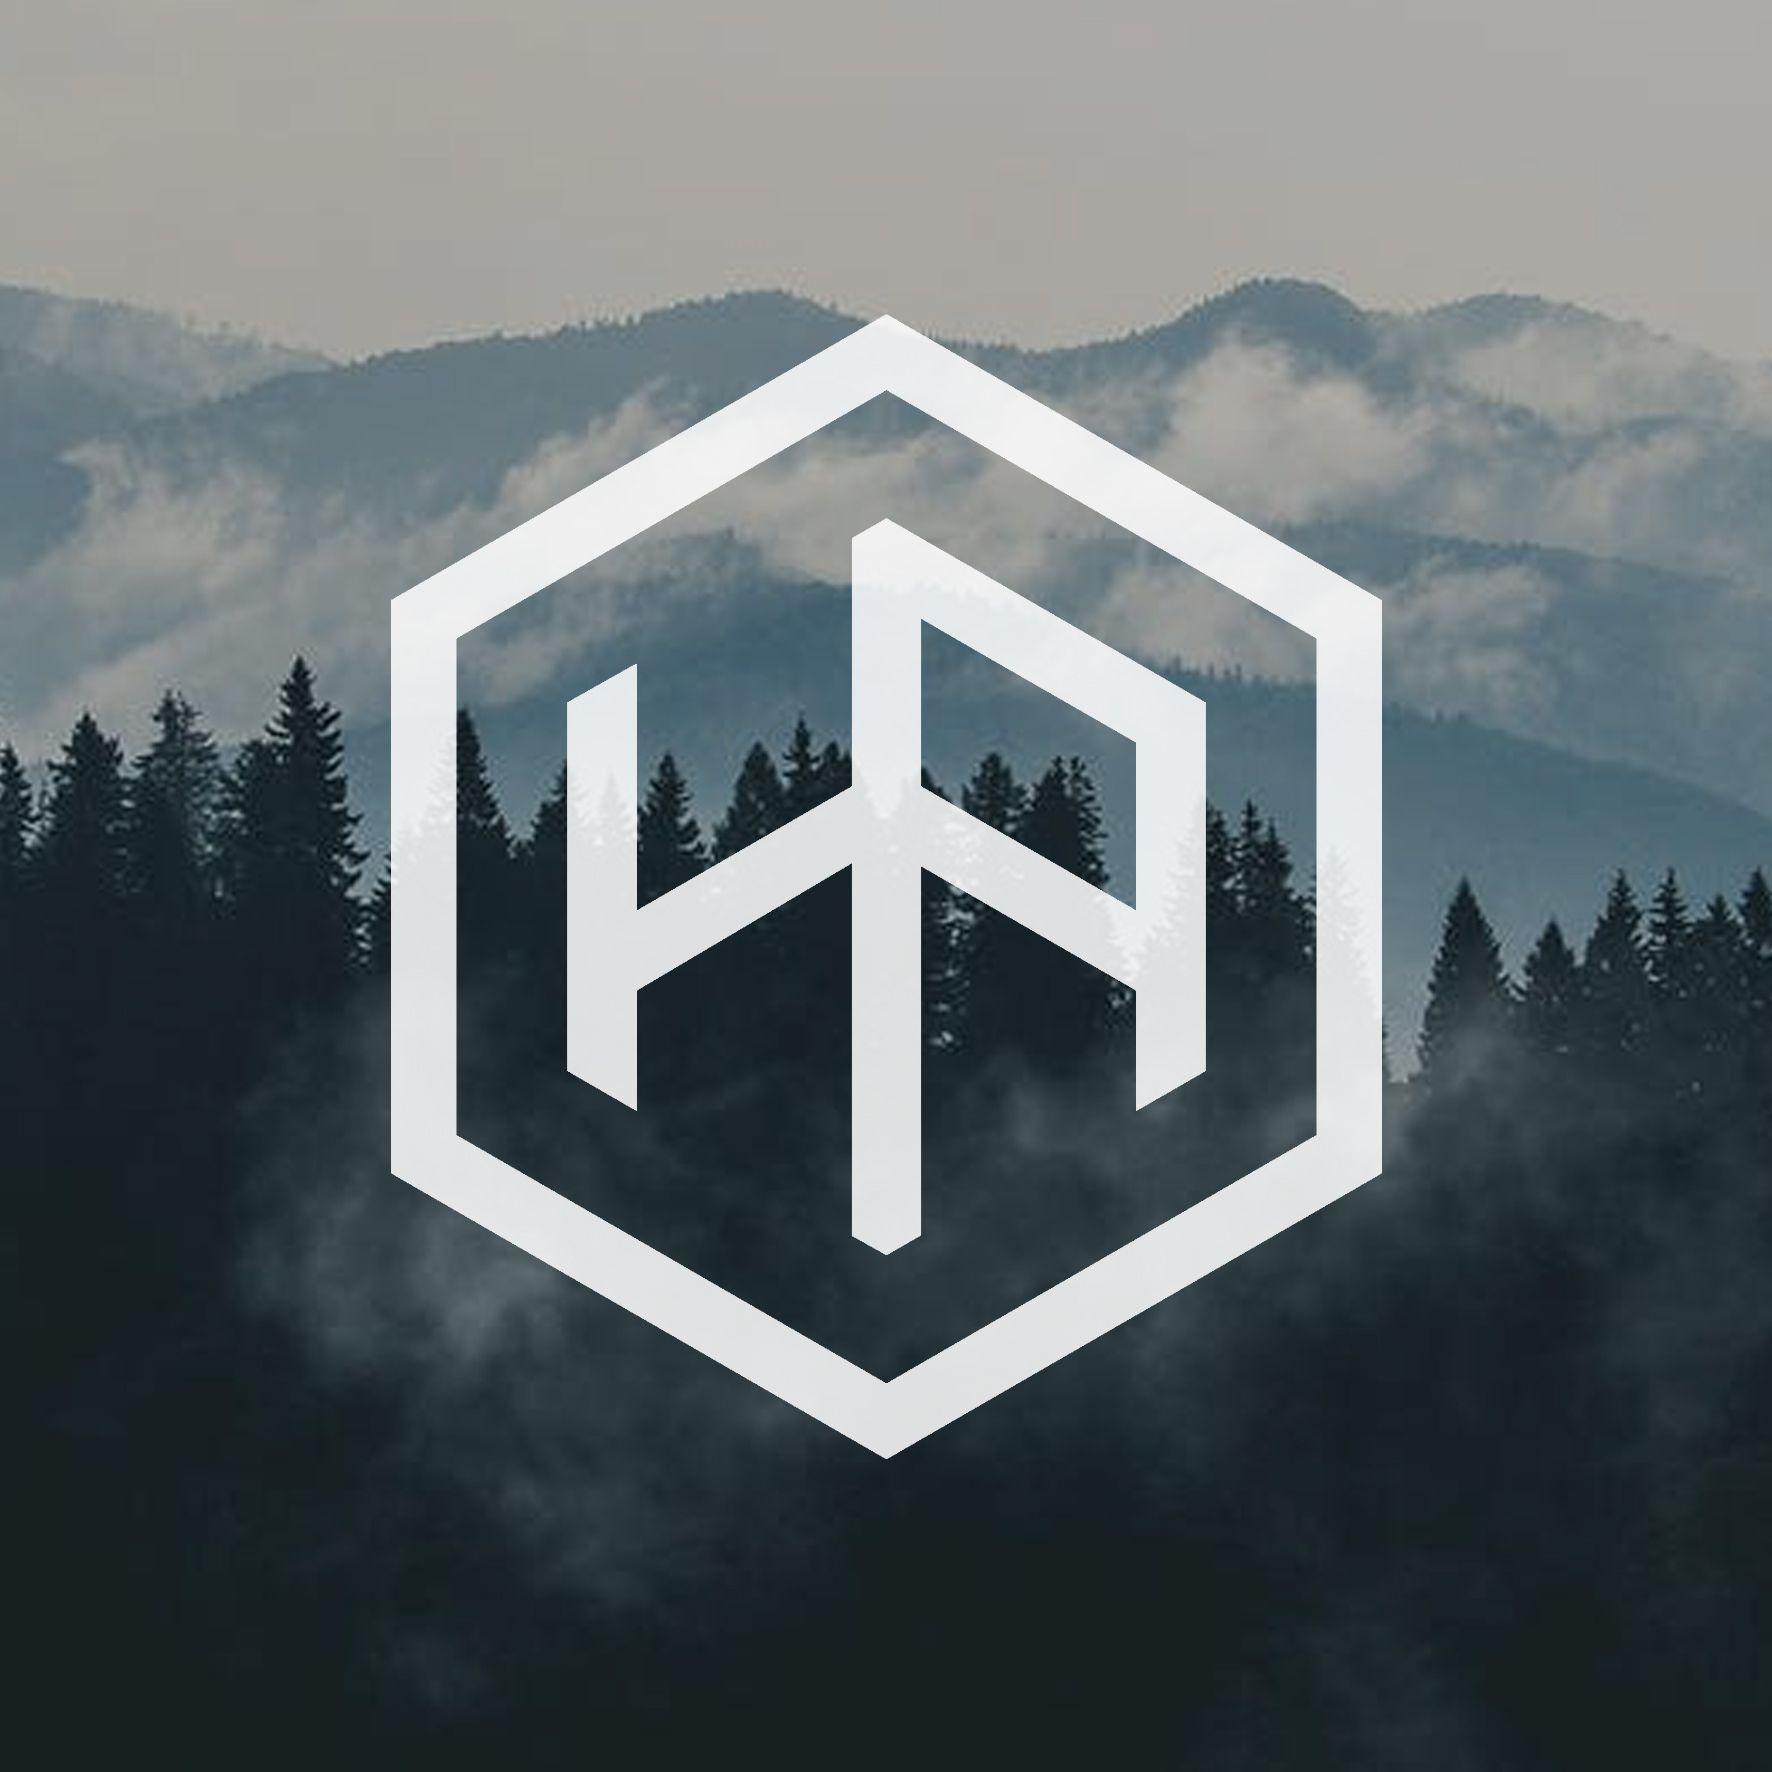 hi i am a graphic designer, i made various logos, this is